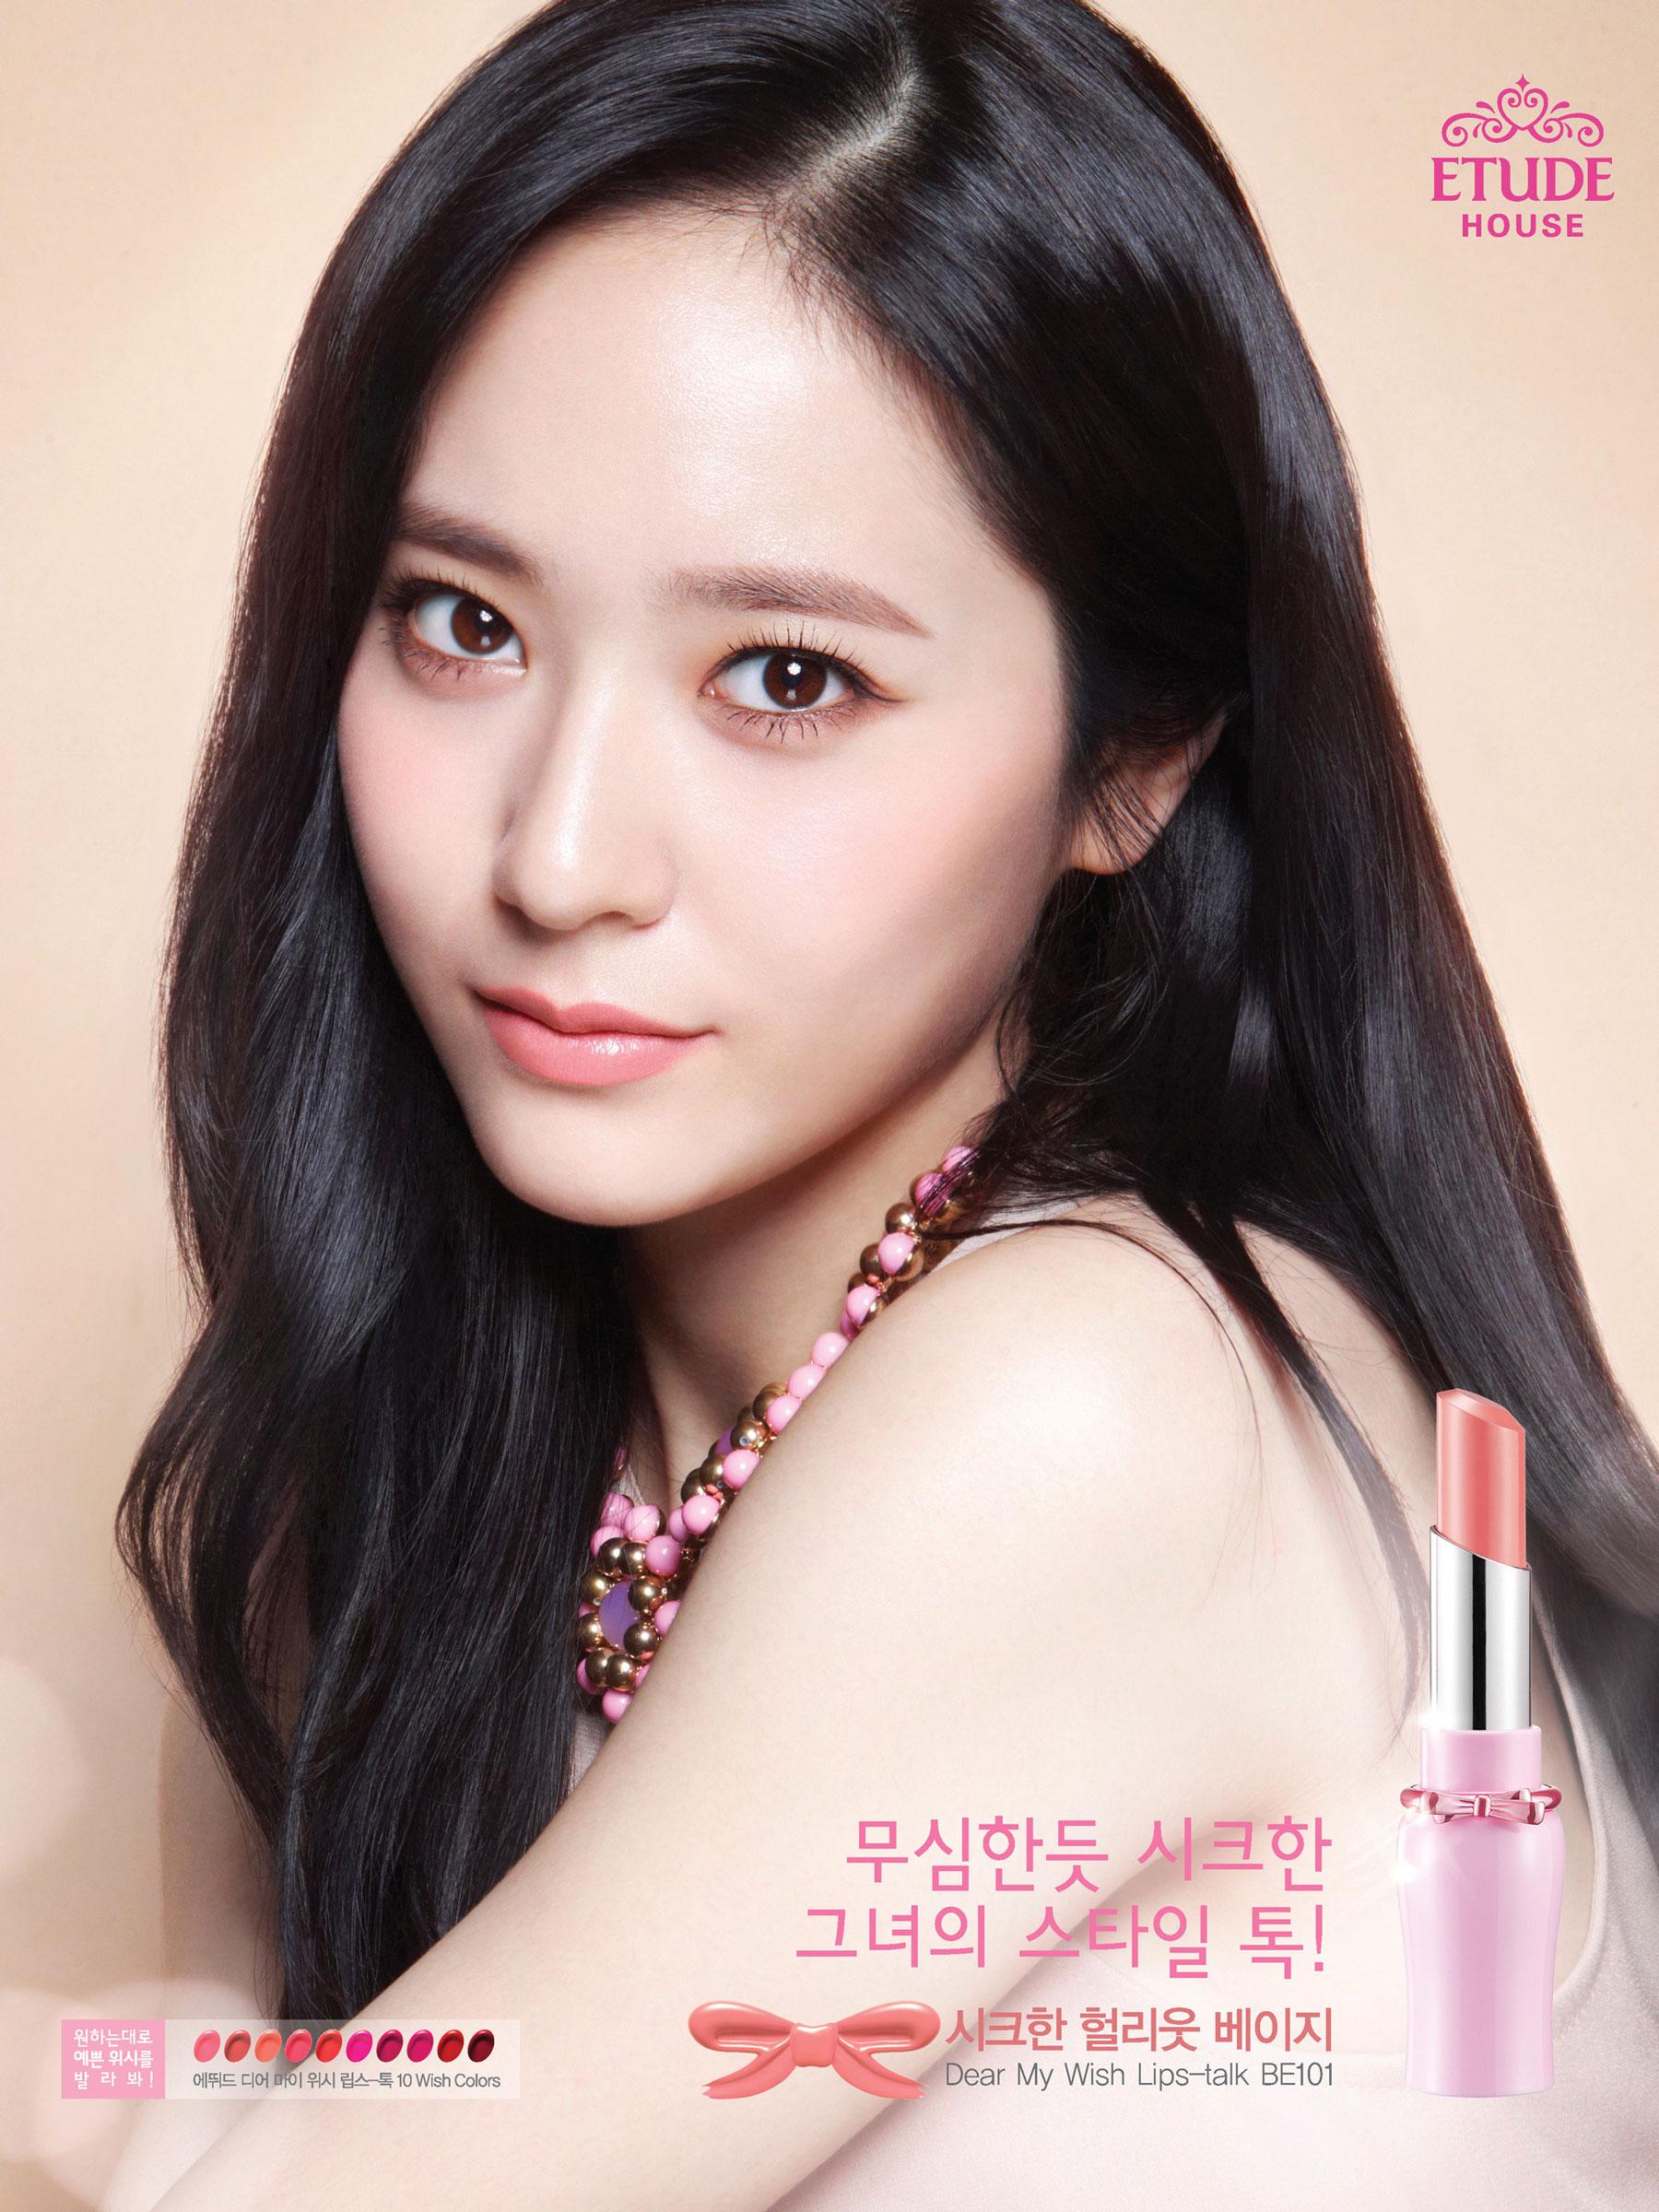 Fx Krystal Etude Korean cosmetics brand